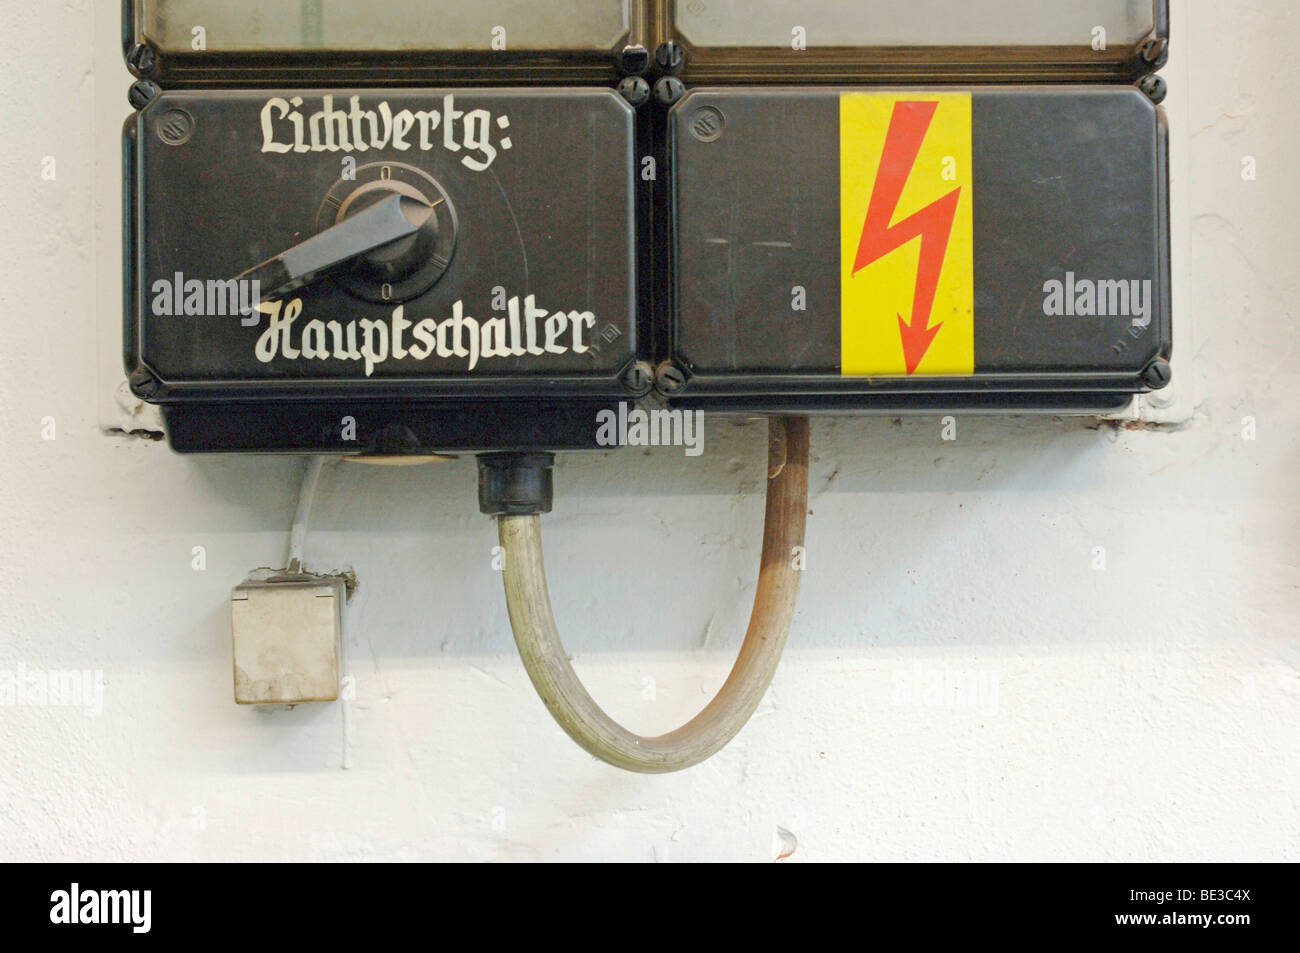 Schön Cooper Elektrische Schalter Ideen - Schaltplan Serie Circuit ...